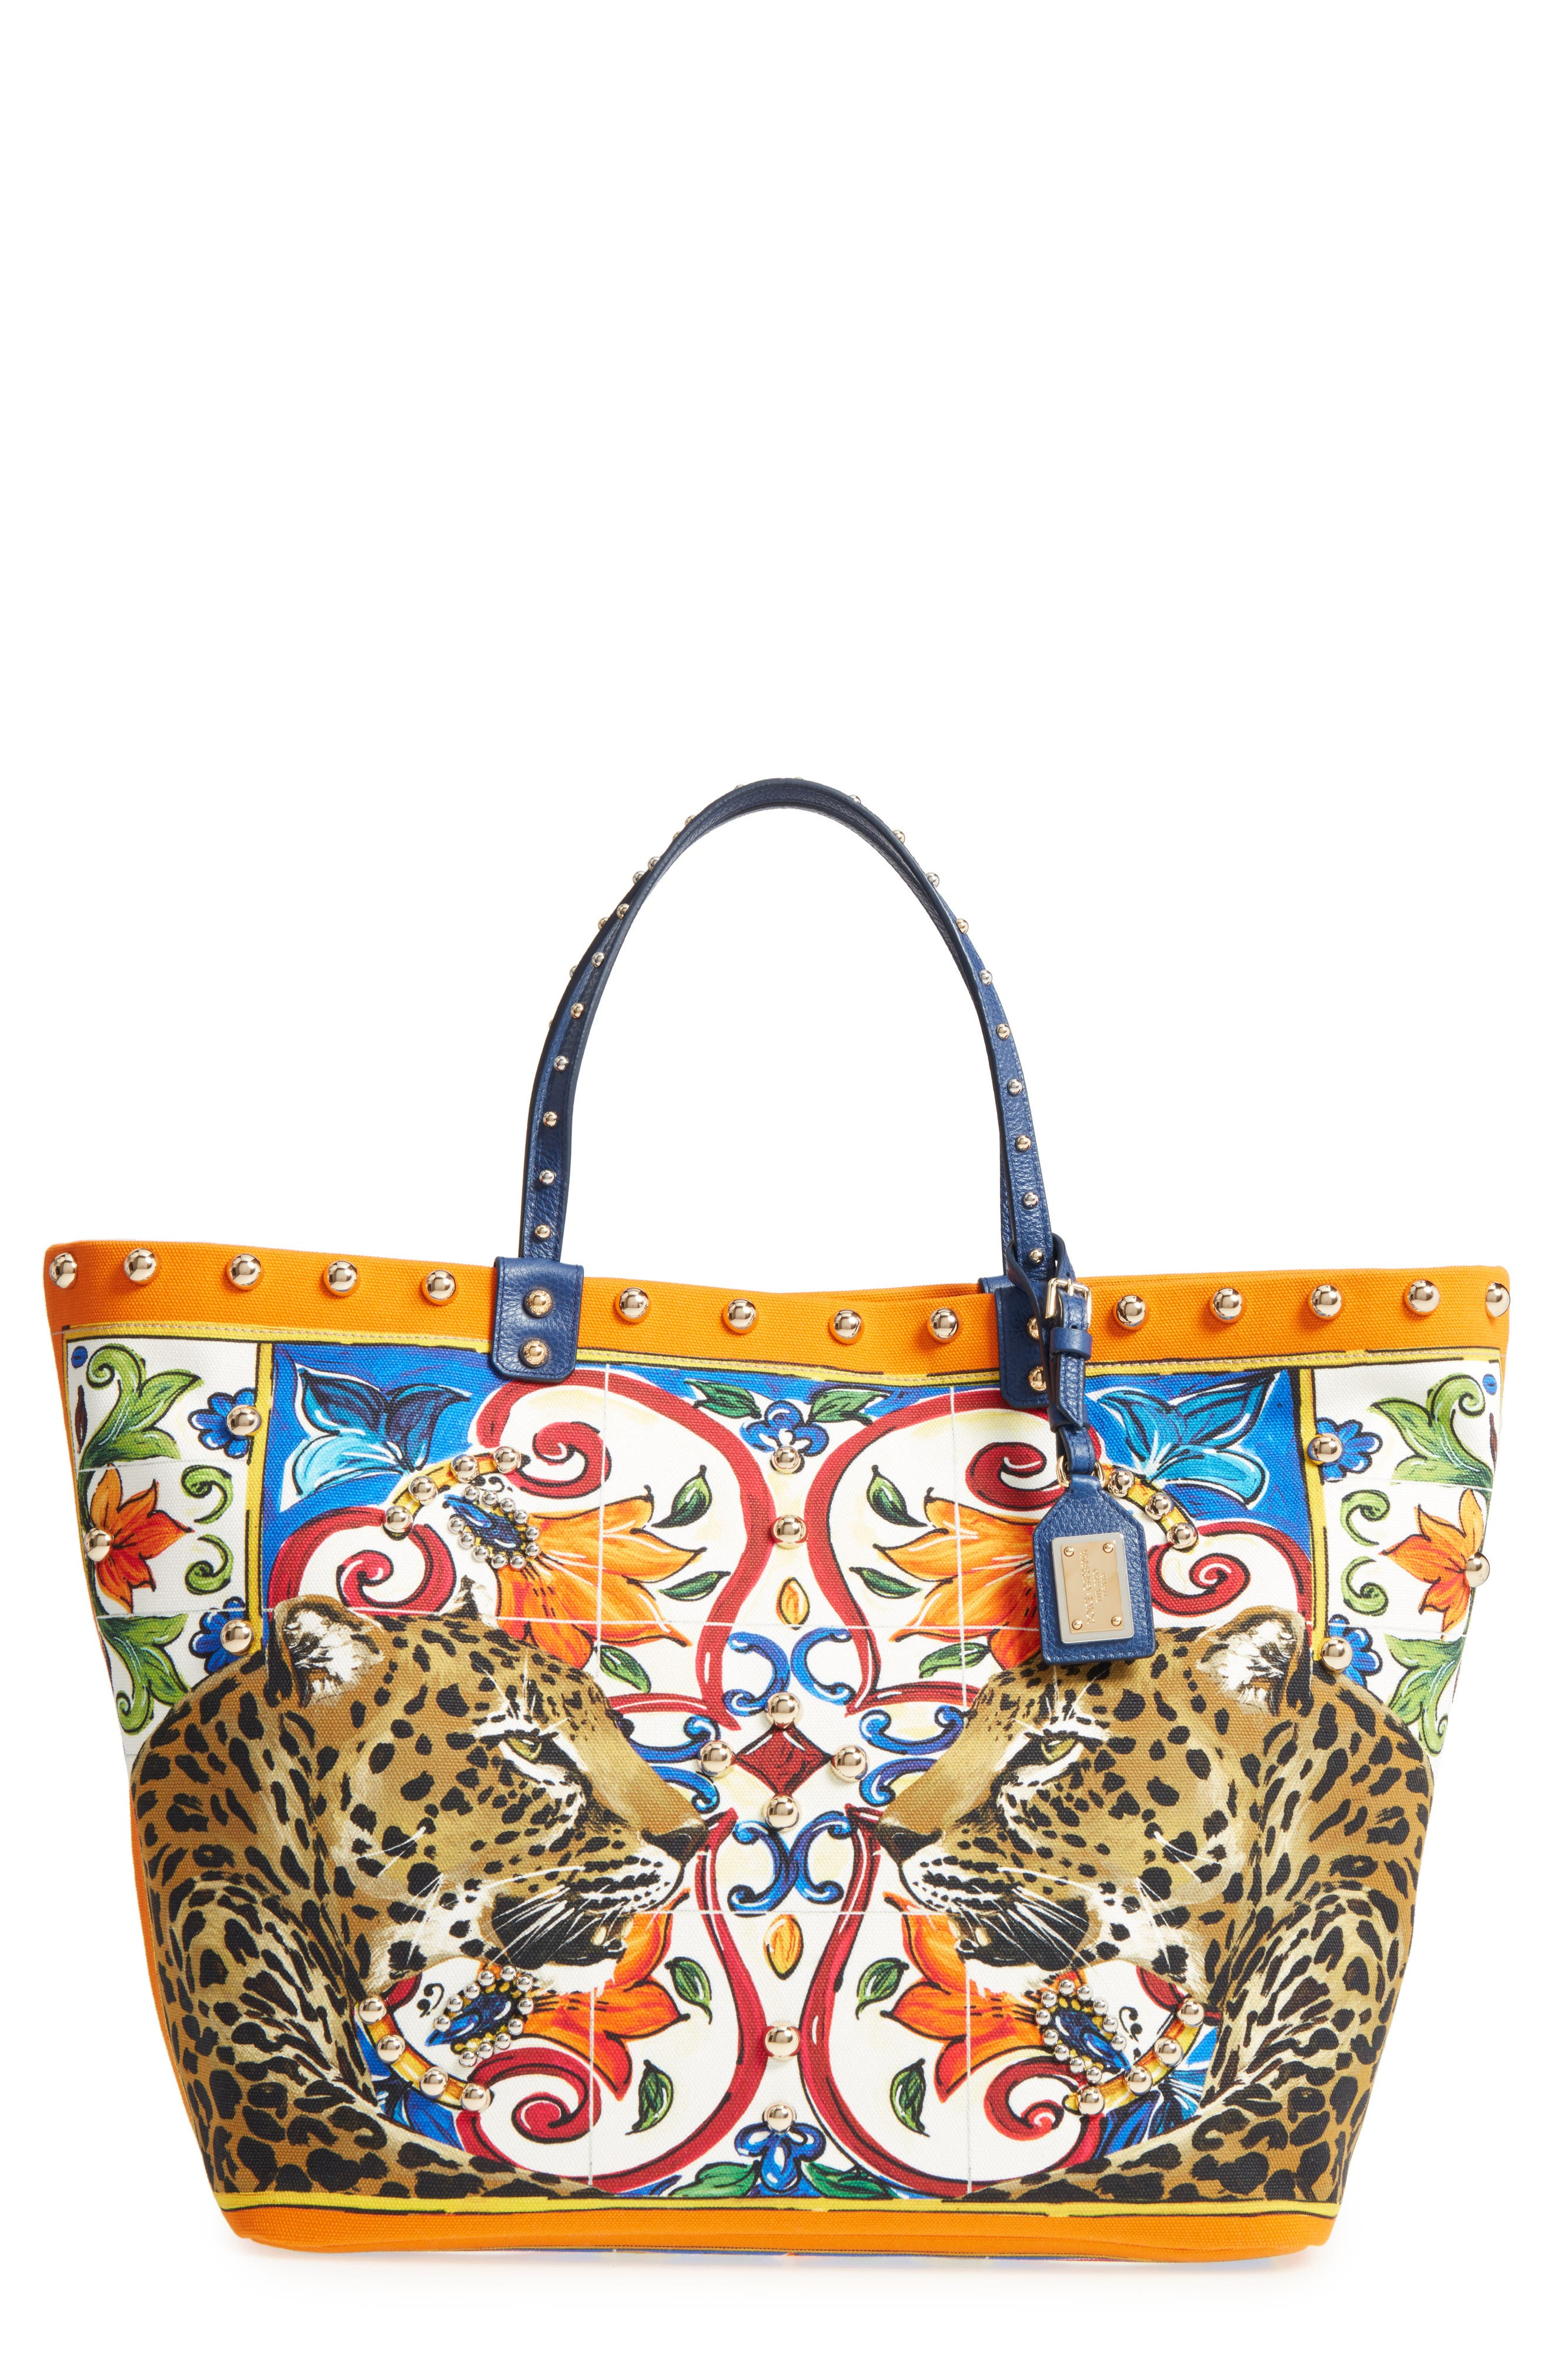 Dolce&Gabbana Maiolica Canvas Tote